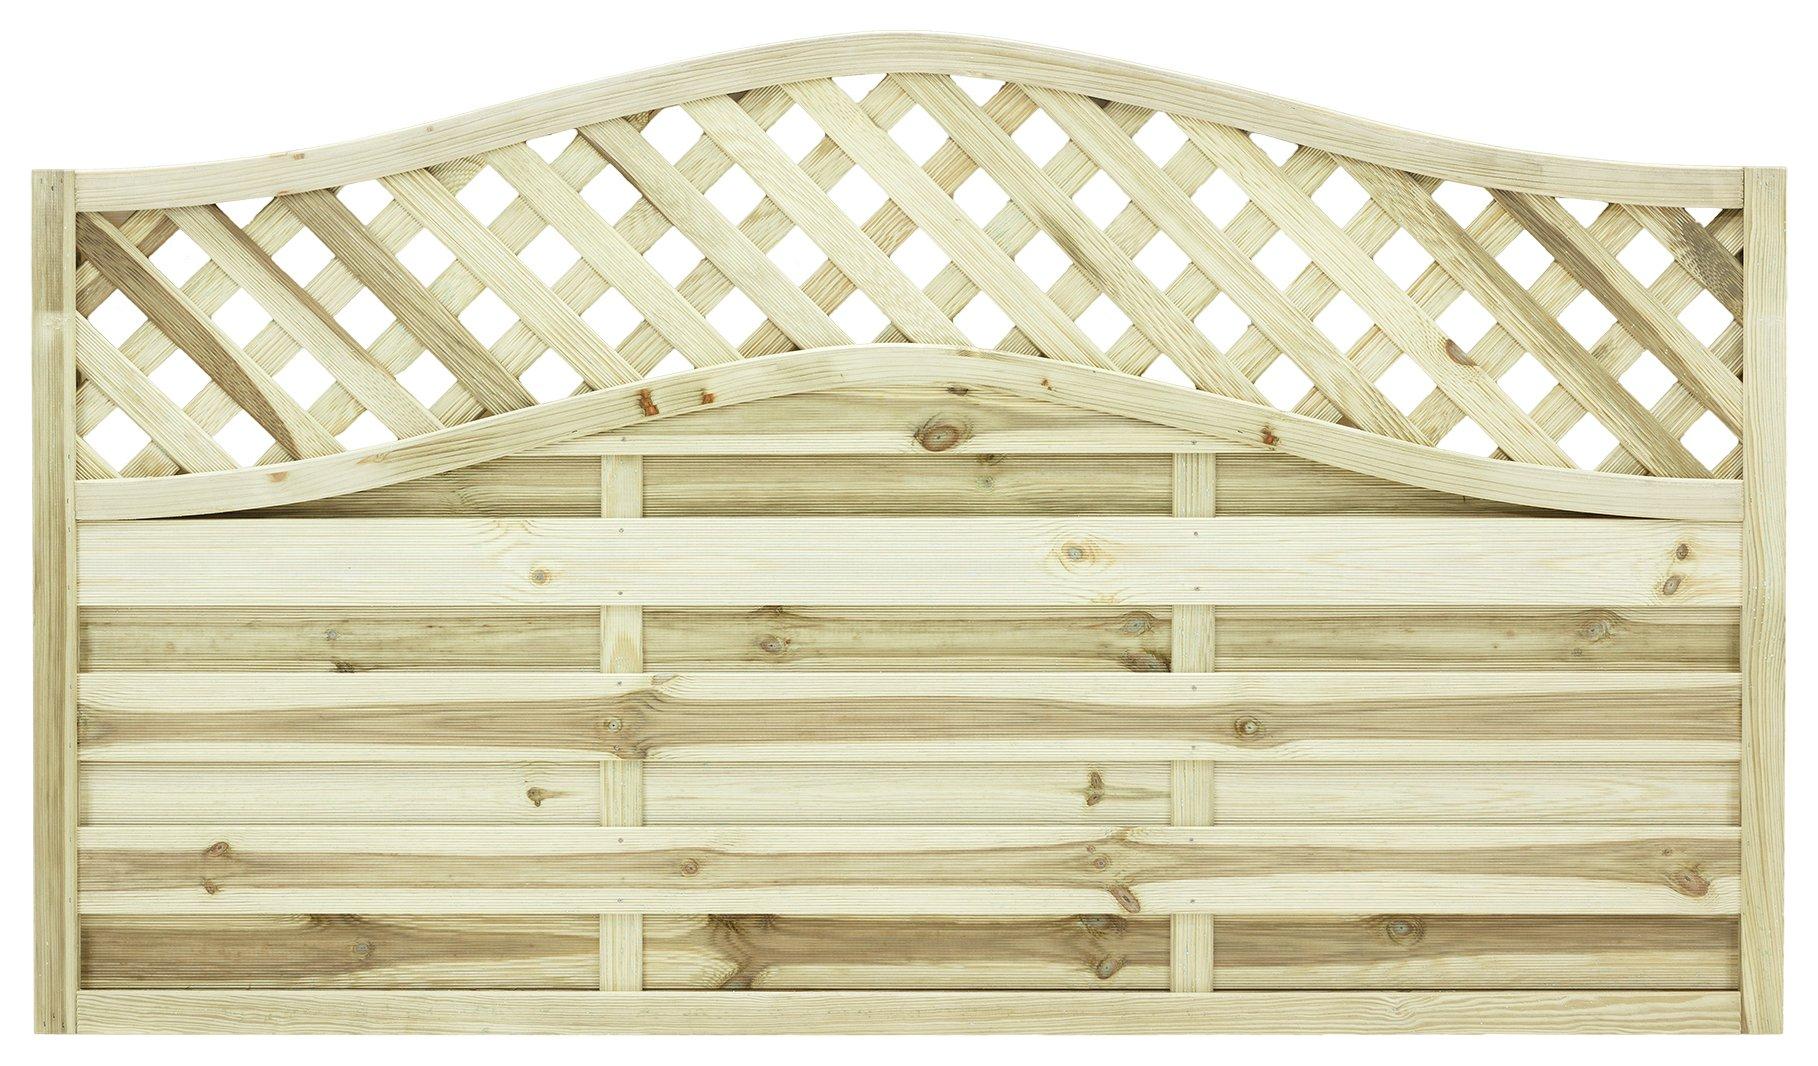 Grange 1.05m Elite St Meloir Fence Panel - Pack of 3. lowest price